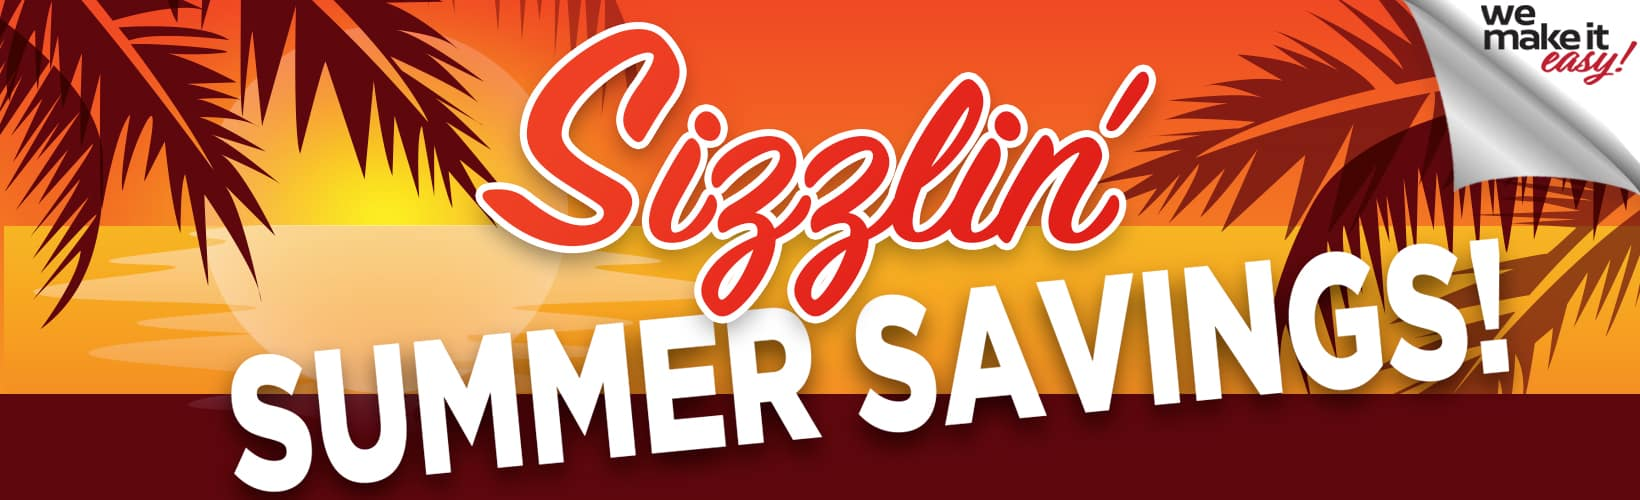 SIZZING SUMMER SAVINGS